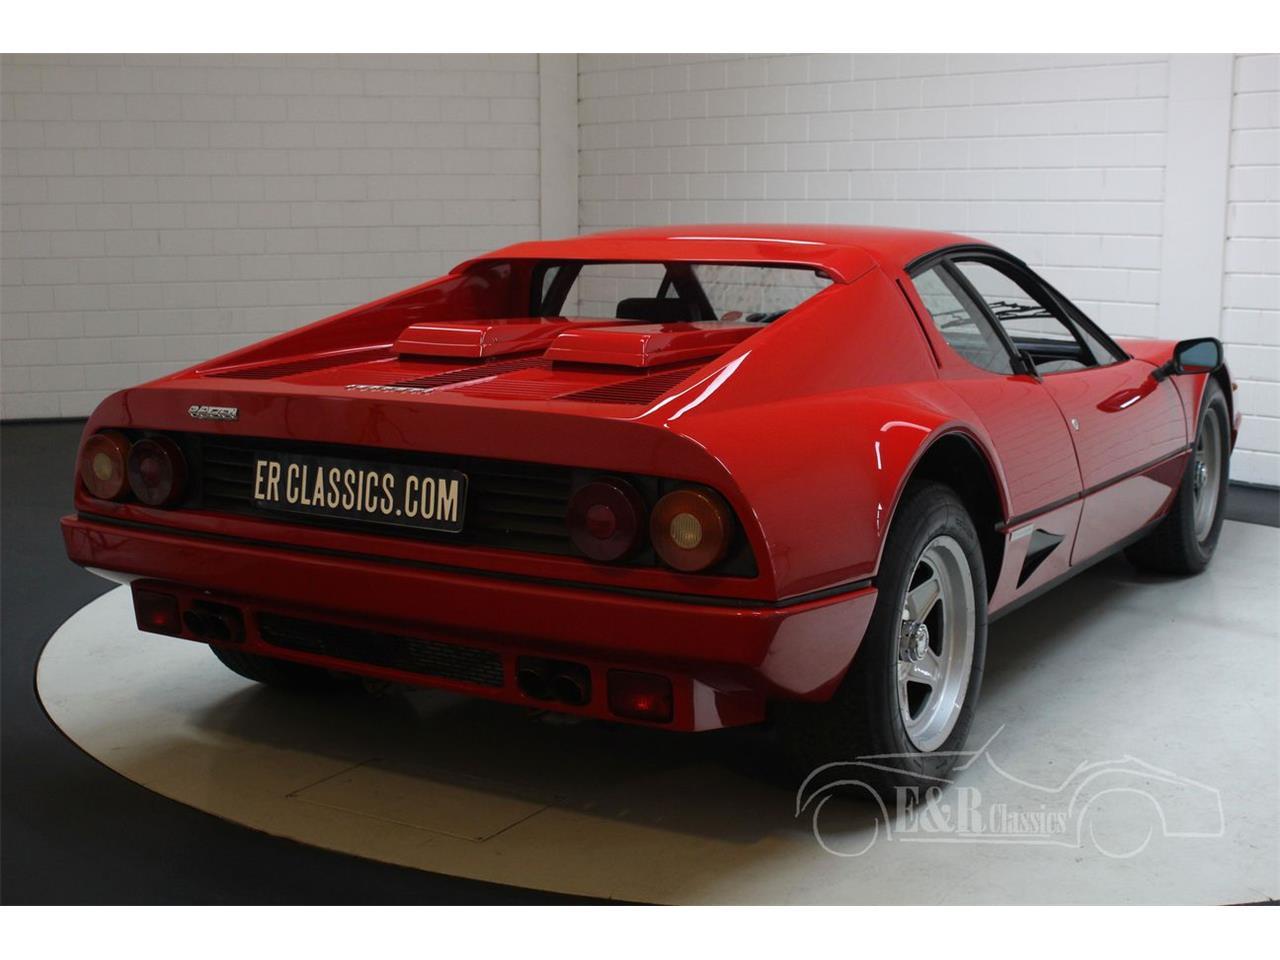 1982 Ferrari 512 BBI (CC-1271646) for sale in Waalwijk, Noord-Brabant